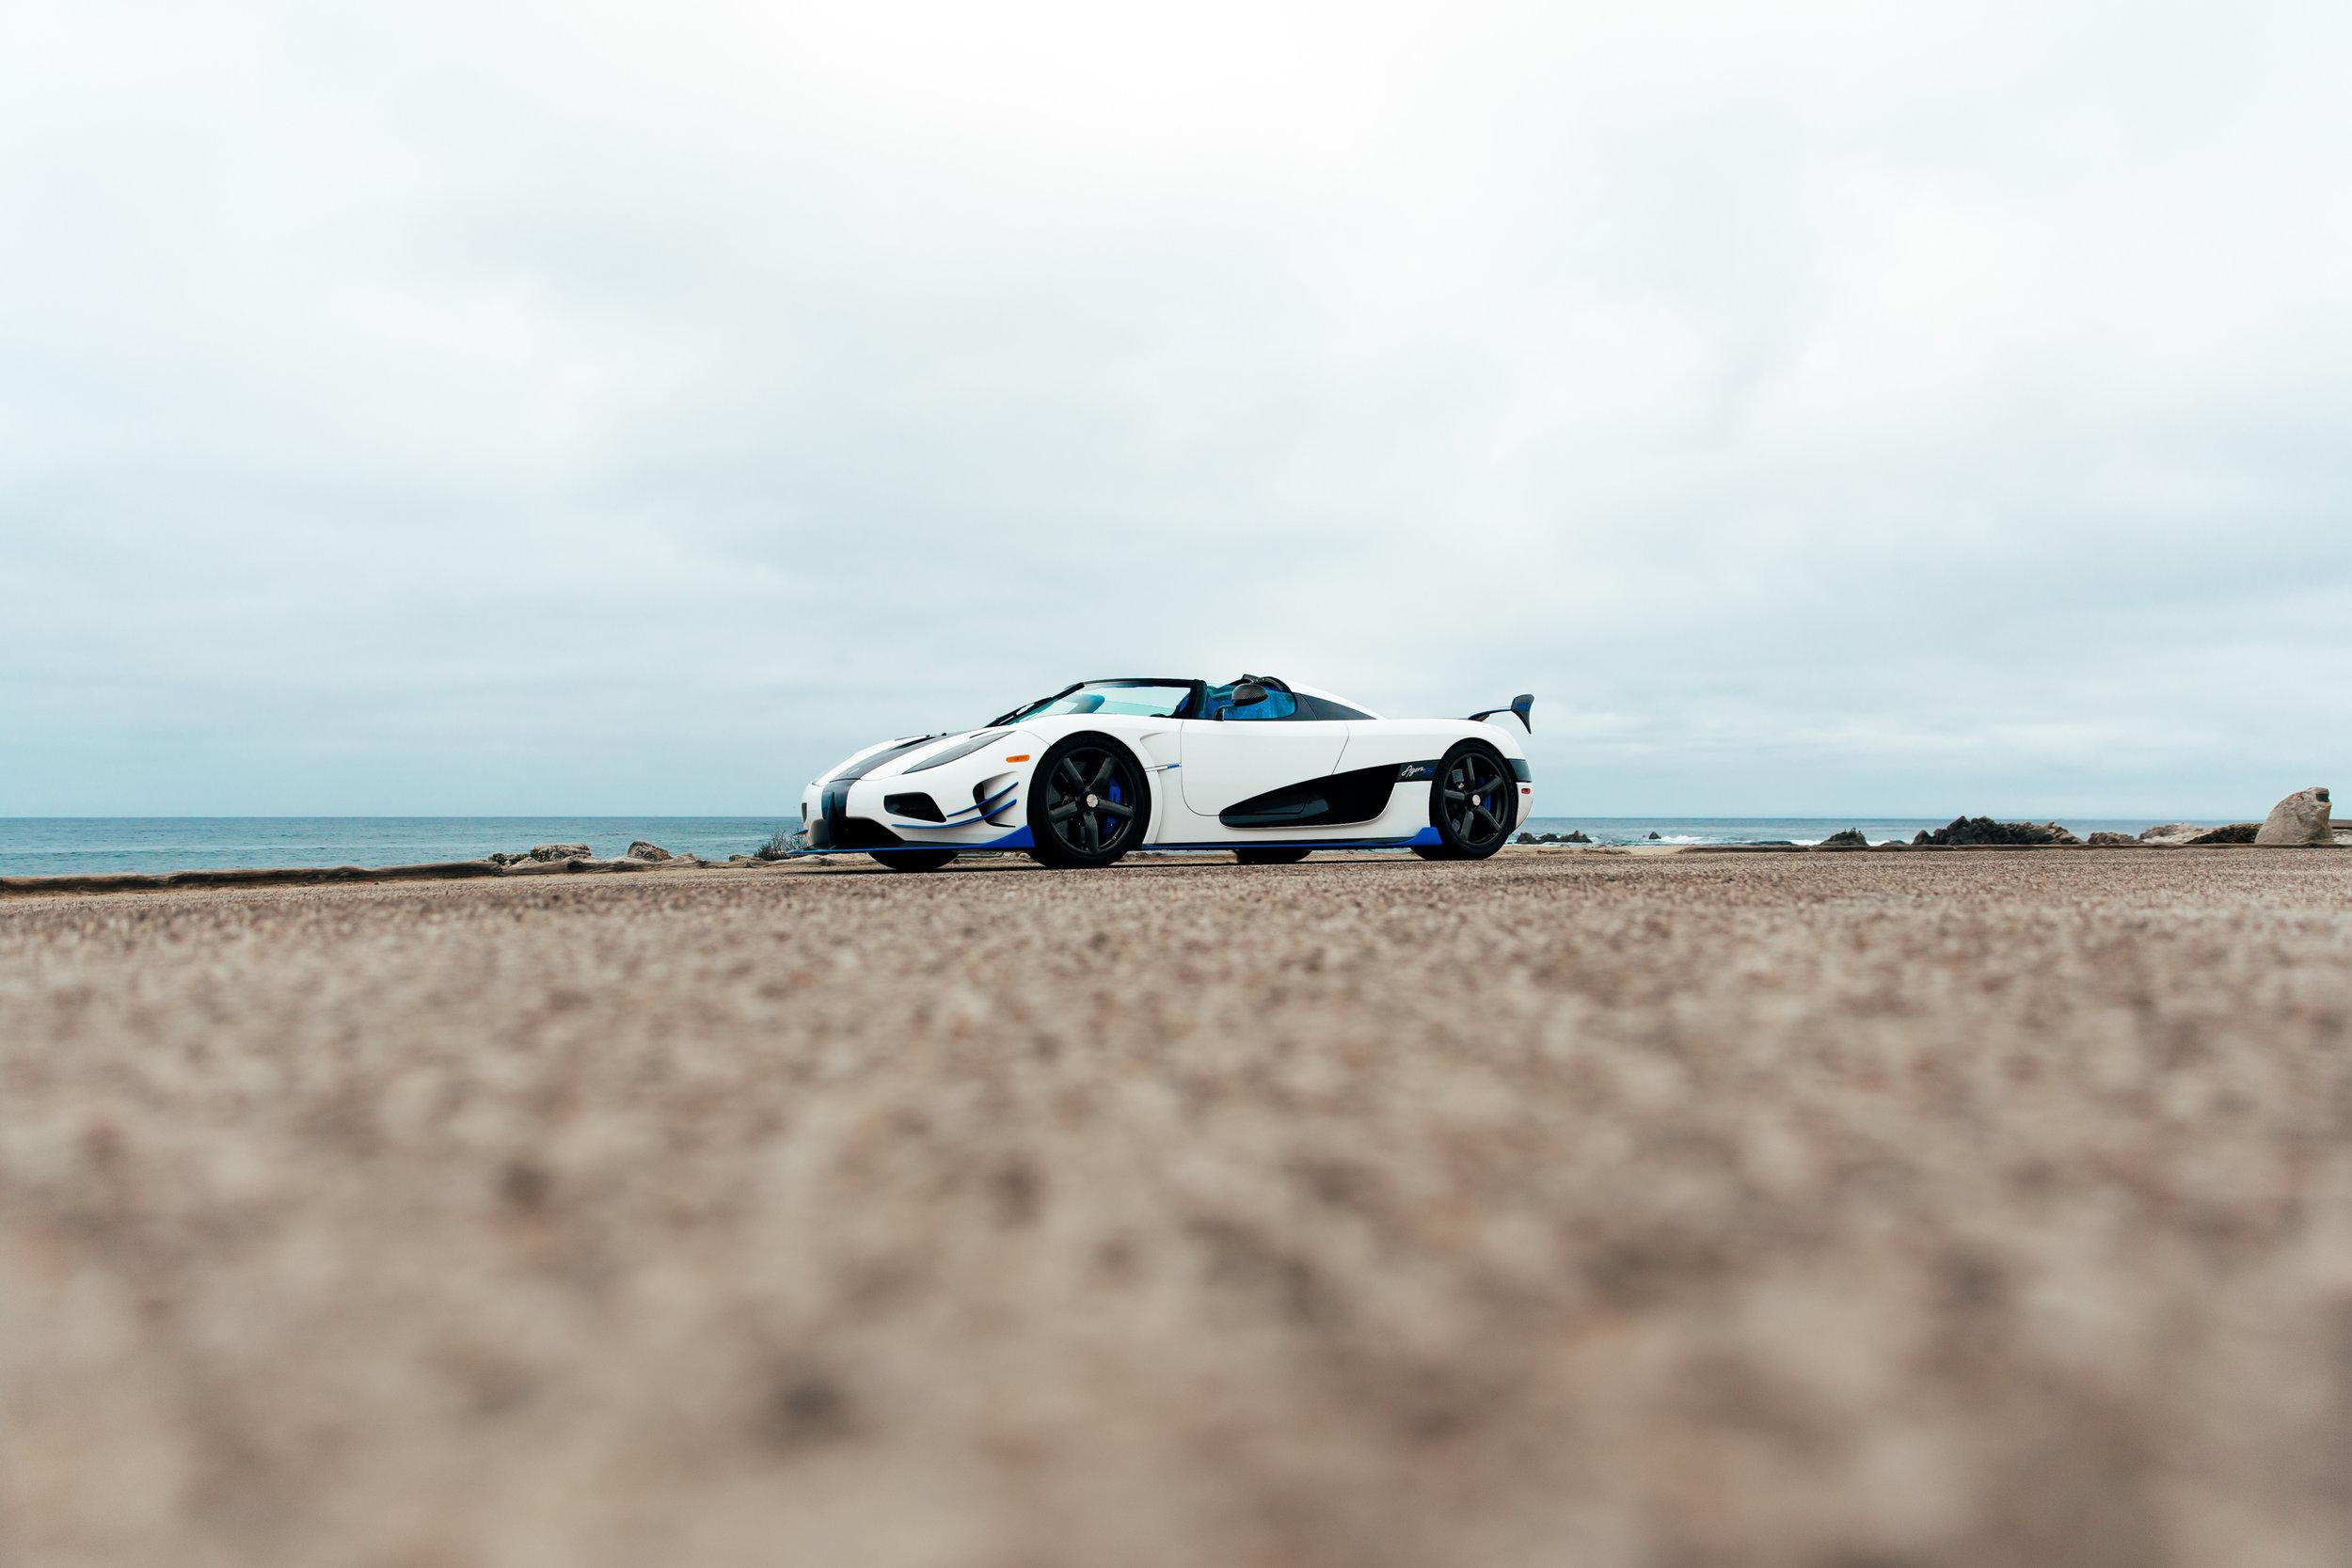 Stay_Driven_Monterey_Car_Week_Whitesse_Koenigsegg-16.jpg